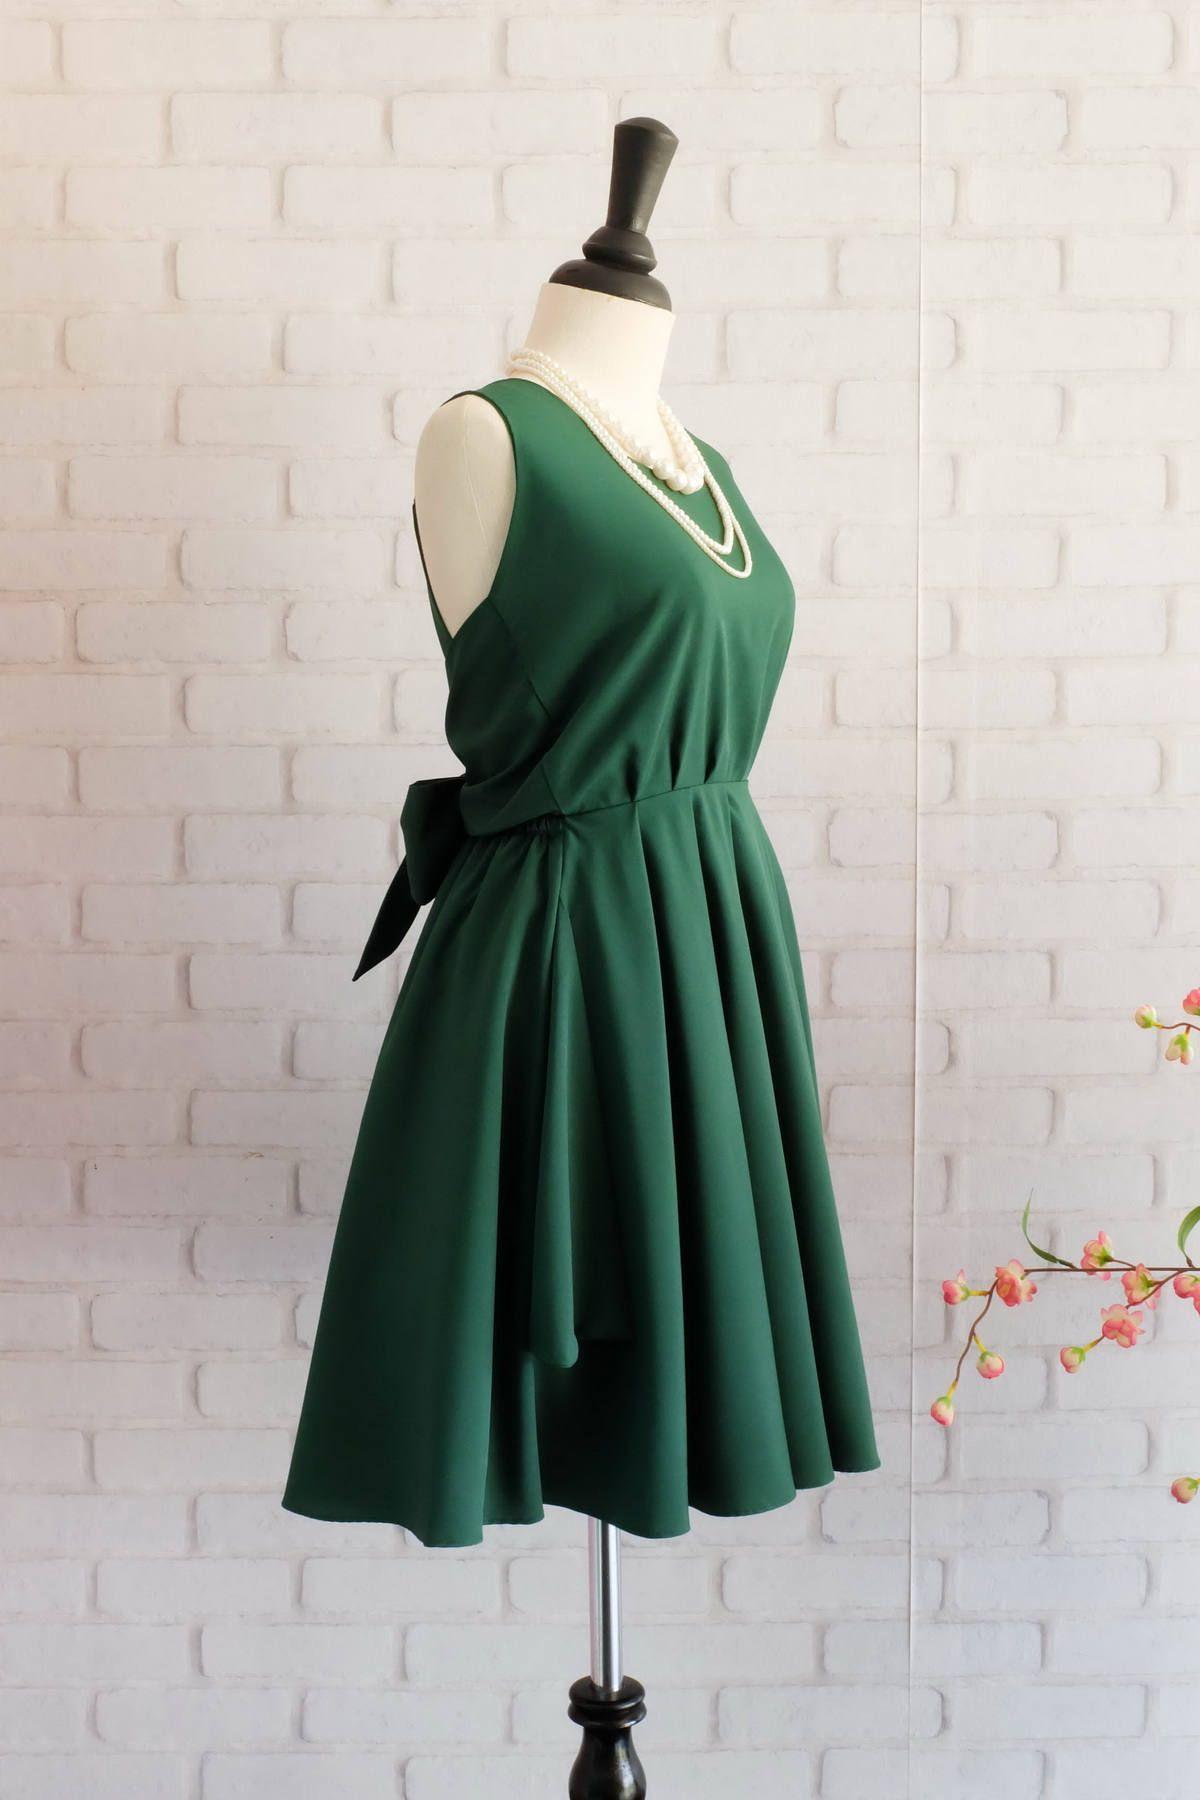 13 Luxus Abend Dress Online BoutiqueDesigner Cool Abend Dress Online Stylish